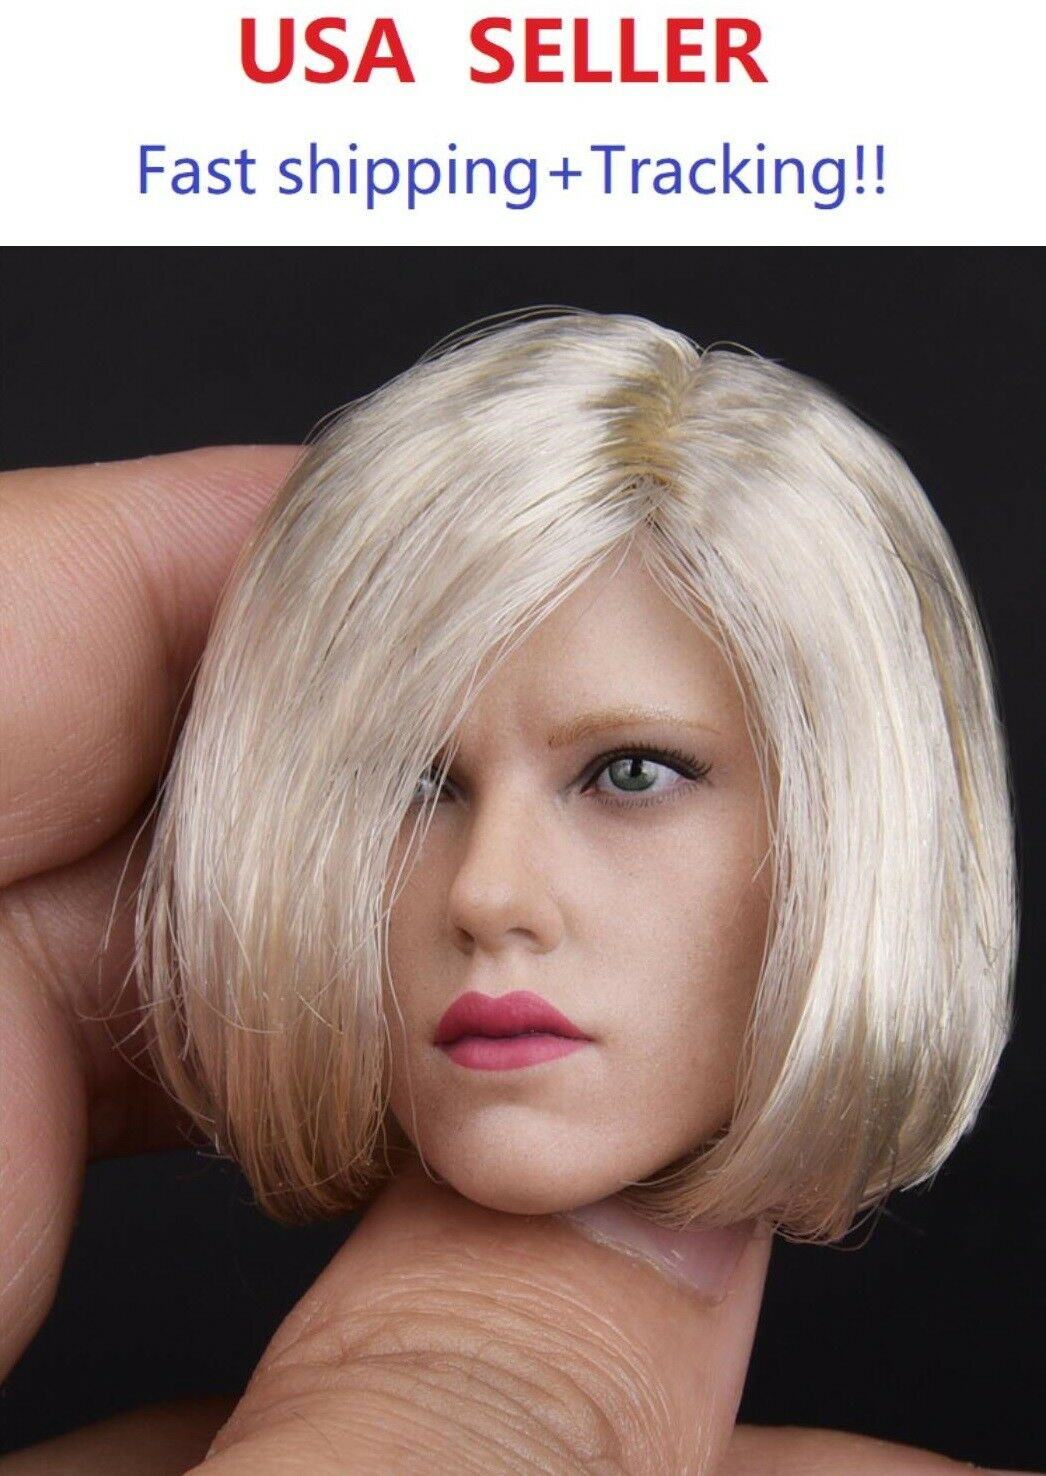 JX toys 1 6 6 6 Scale Scarlett Johansson w  blonde SHORT hair Head Sculpt for Phicen 37b3df